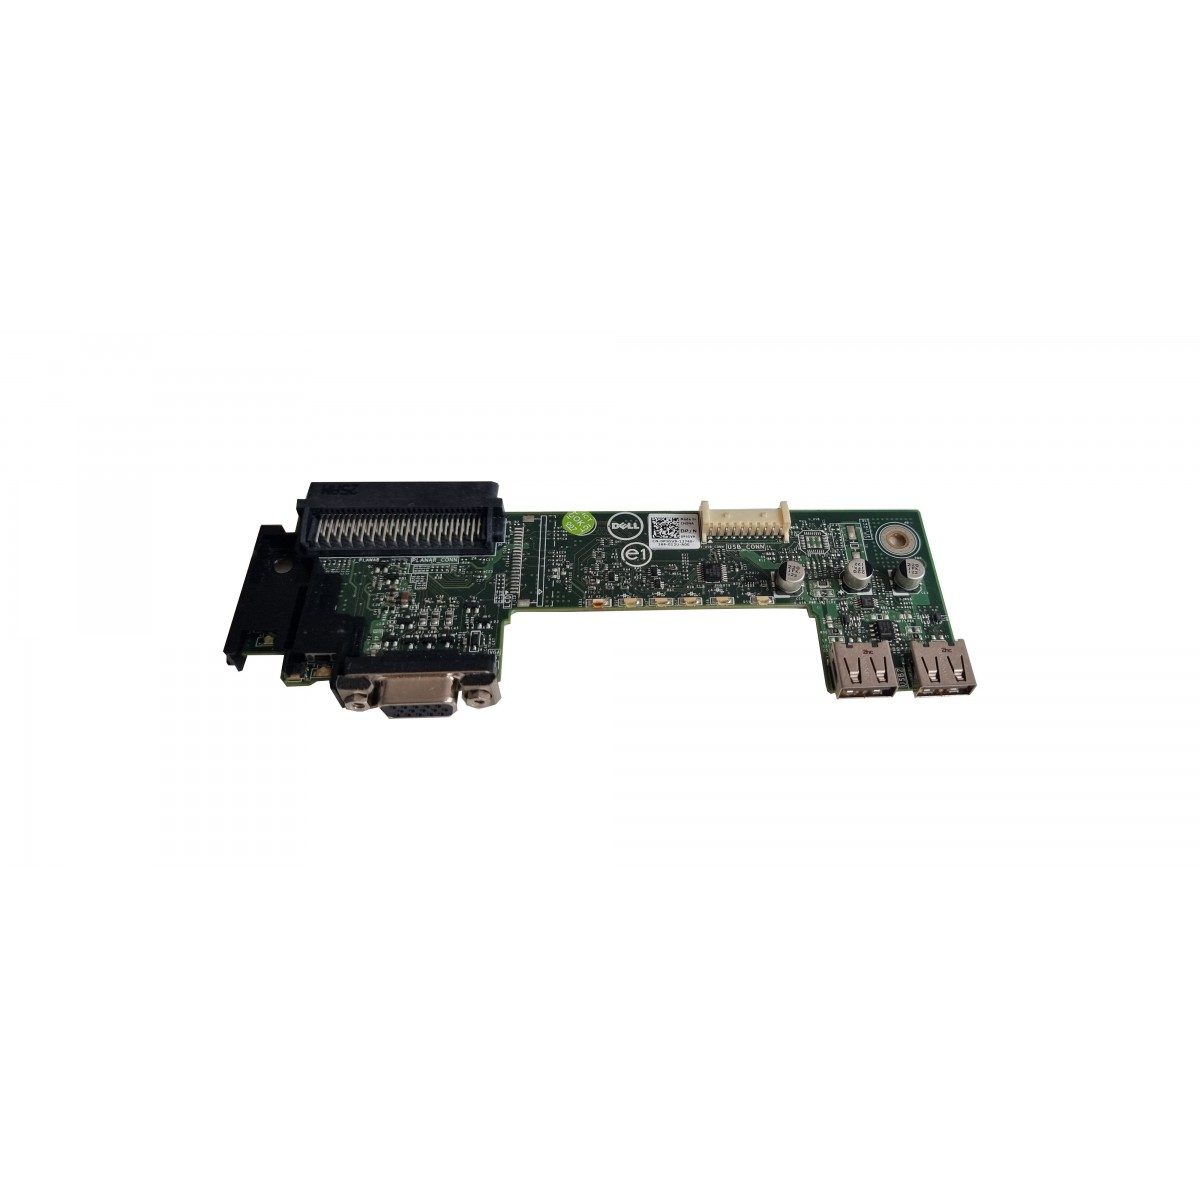 FRONT CONTROL PANEL DELL PE R320 R420 0PJGV9